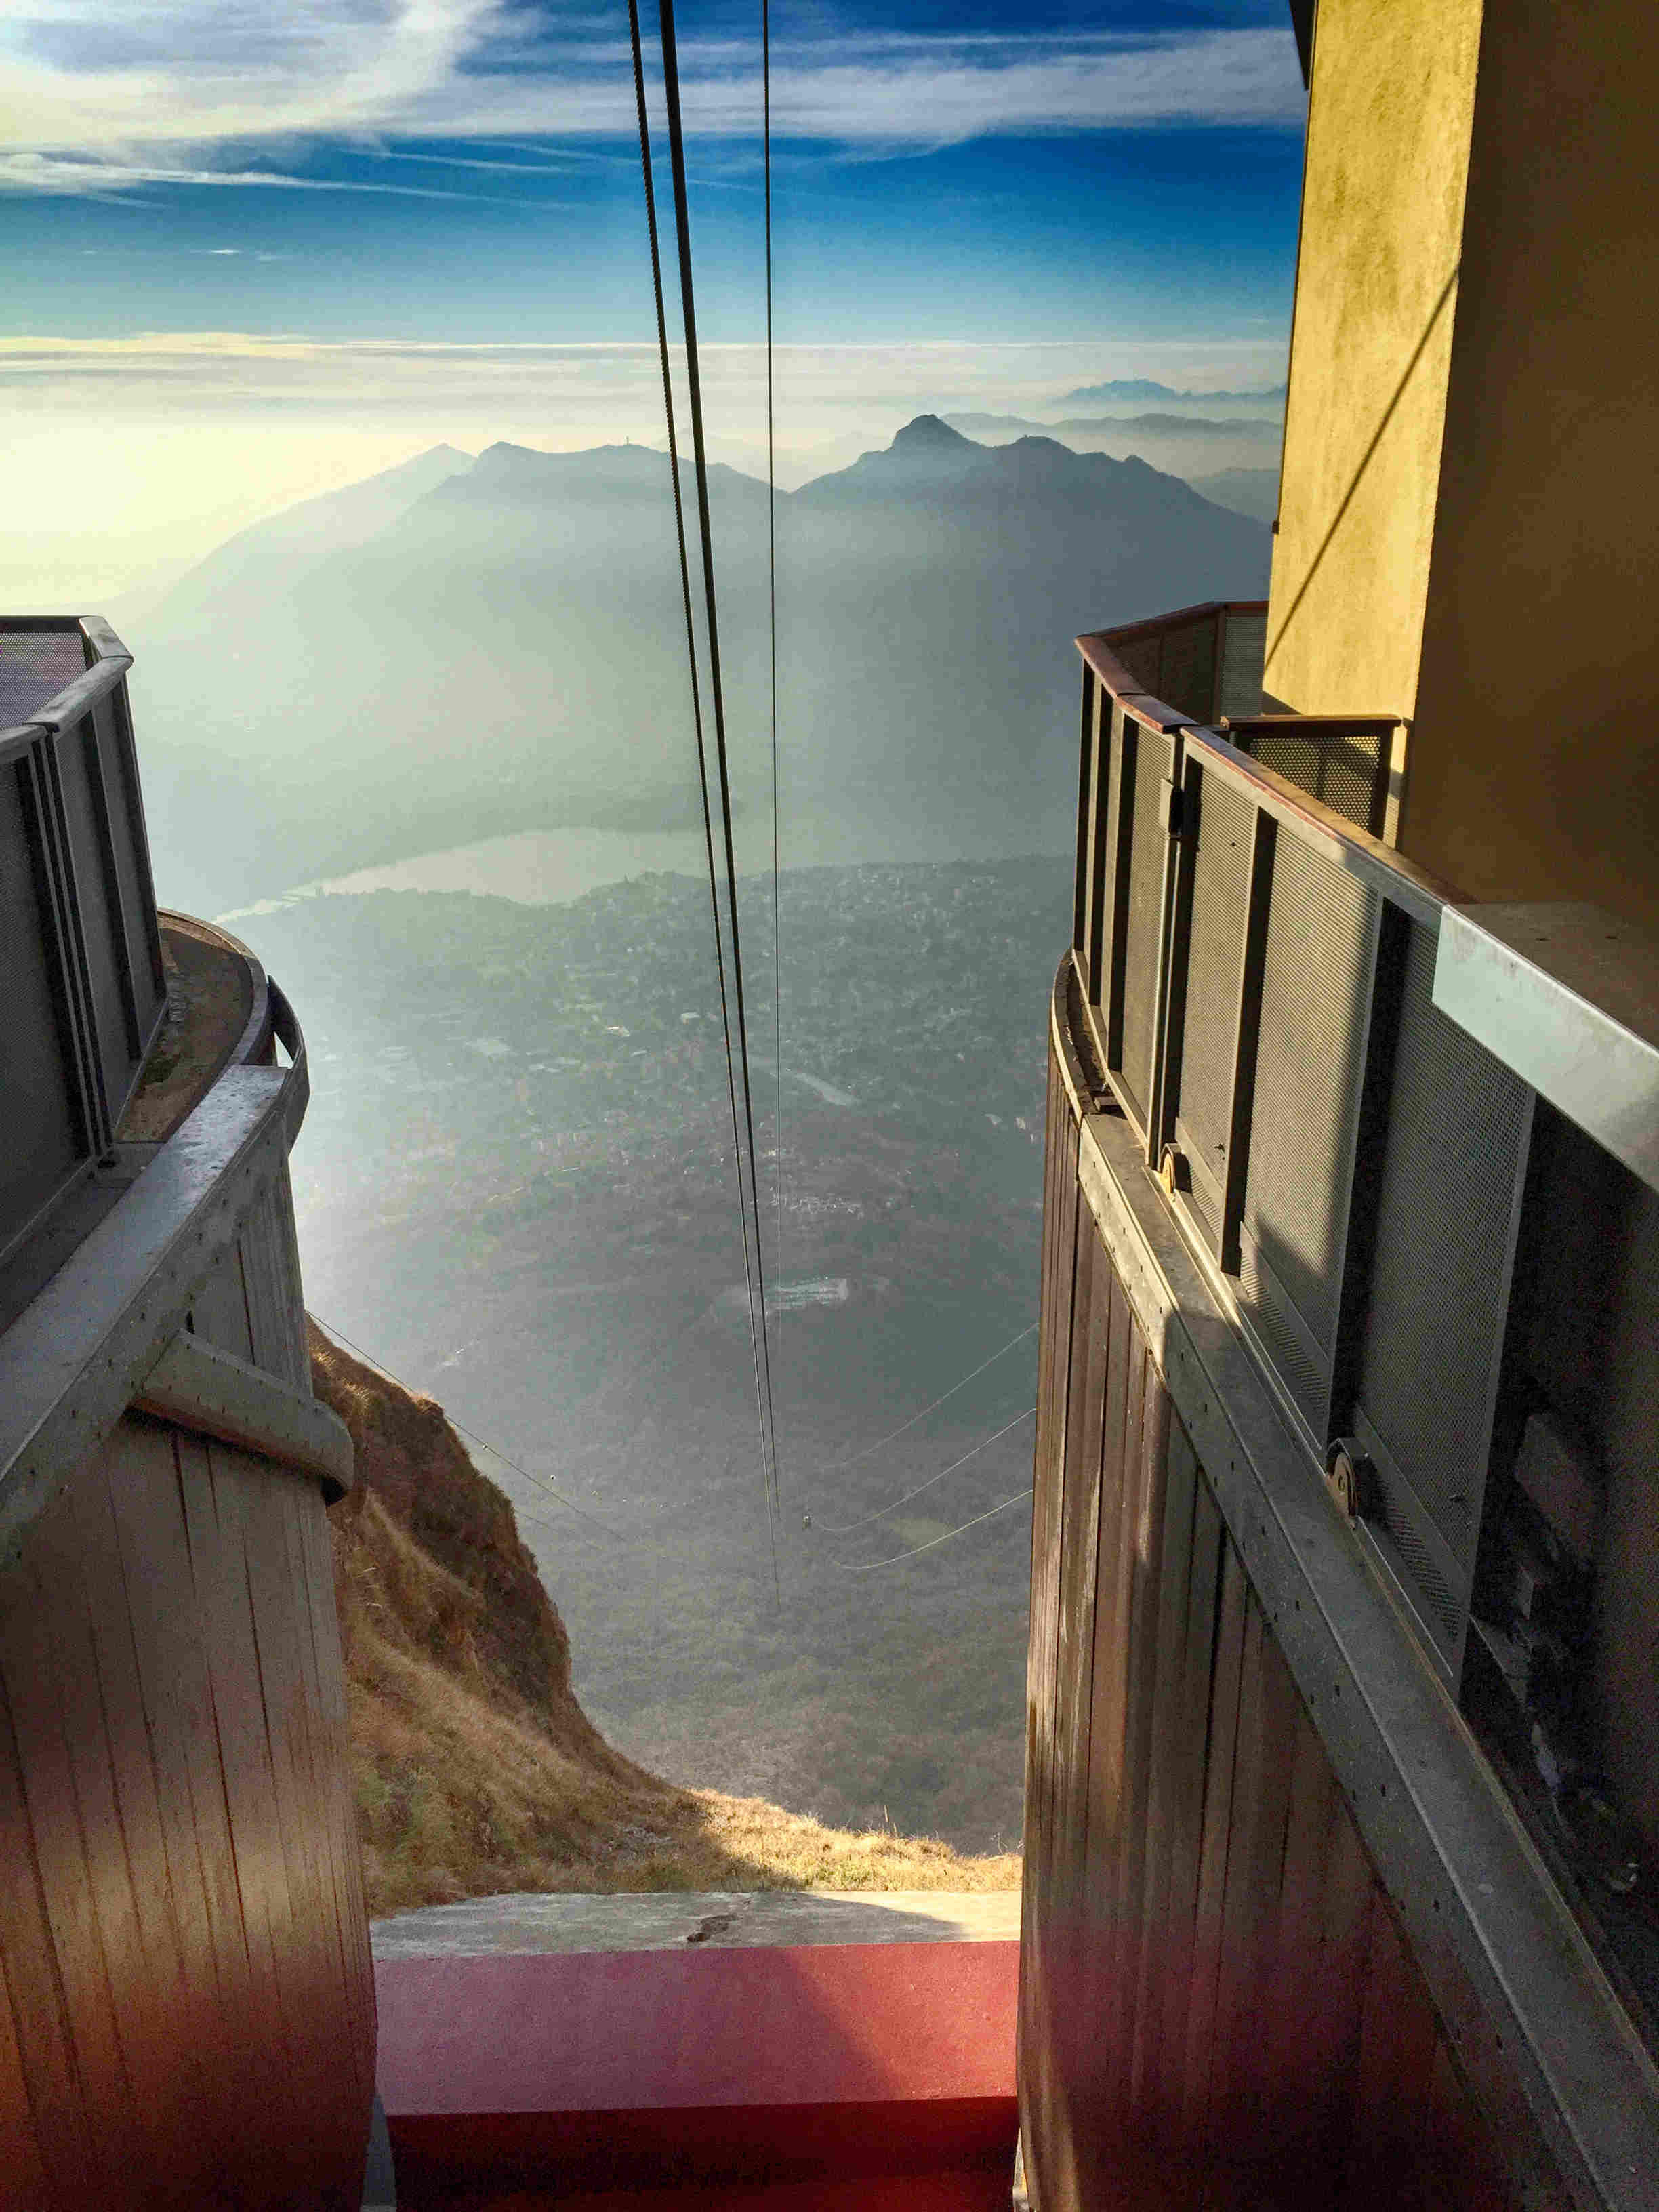 Comer See Wandern Tipps: Die Seilbahn zum Pizzo d`Erna über Lecco